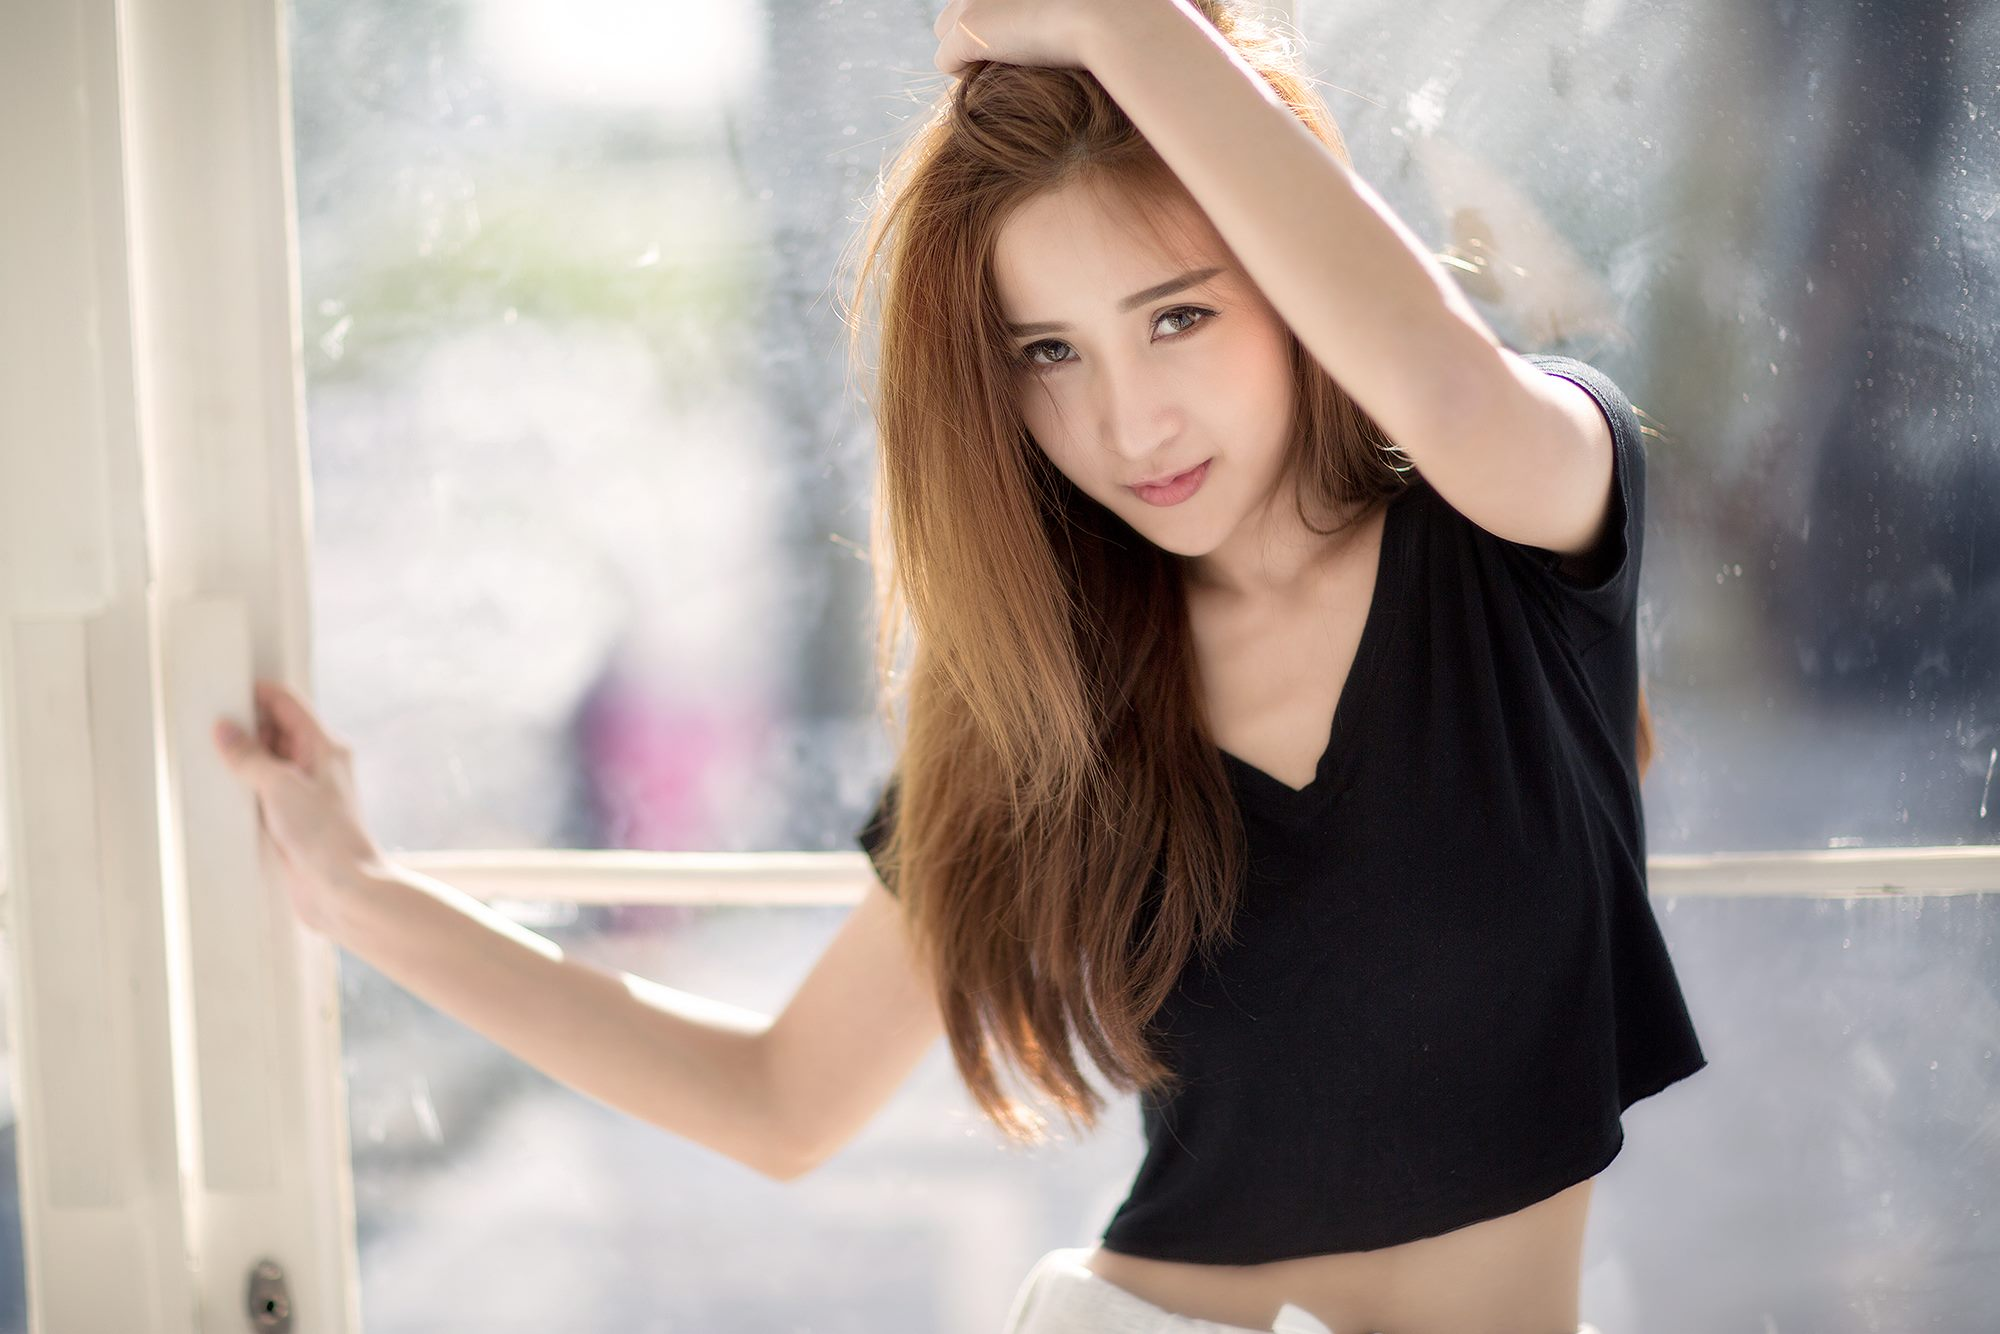 Wallpaper girl cute asian Girls Images